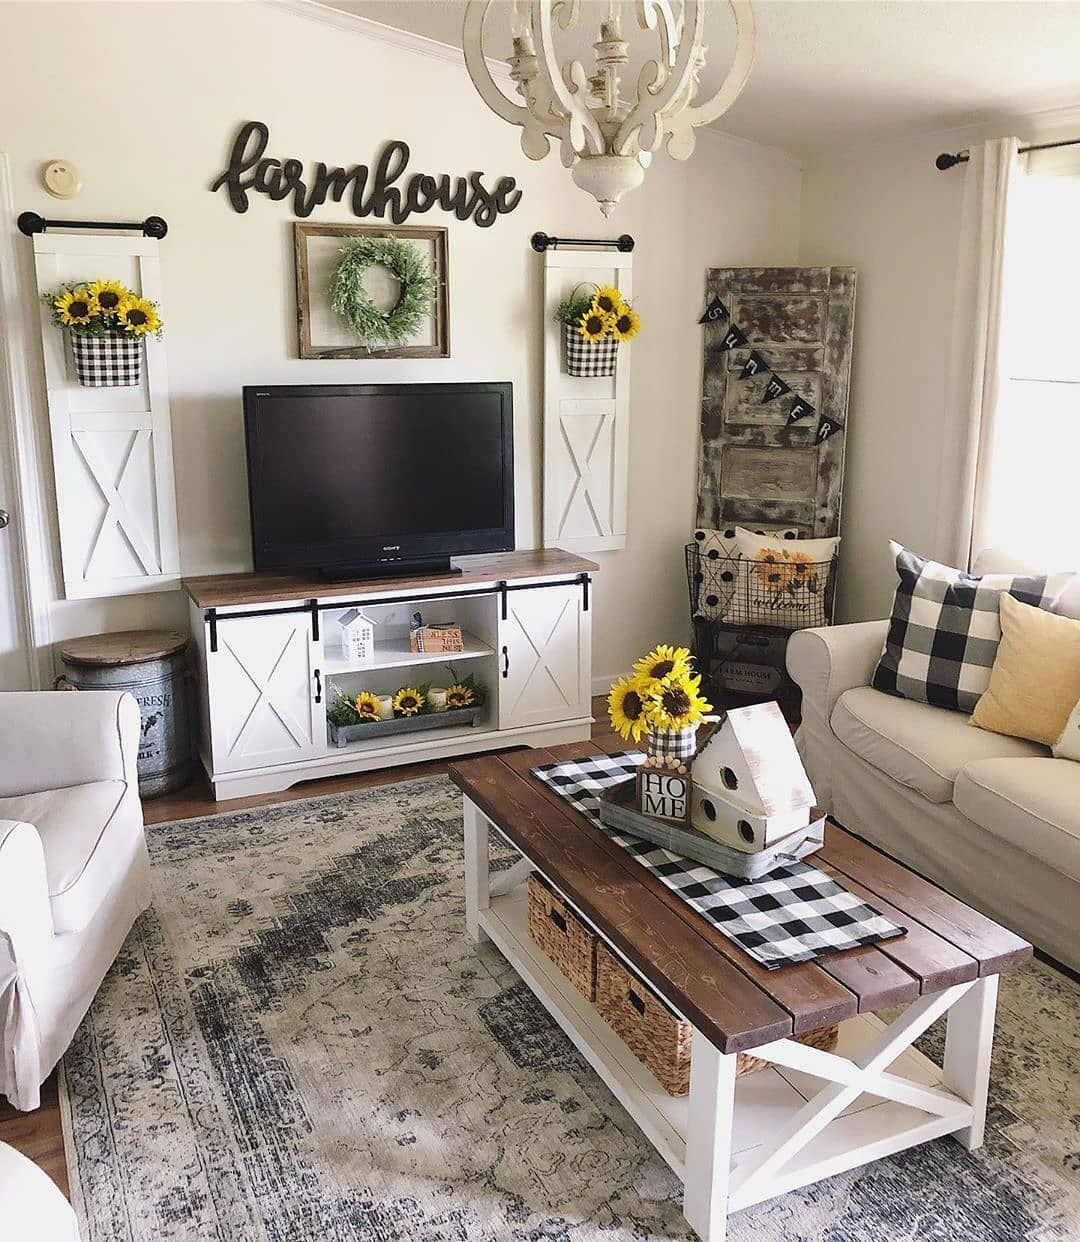 Farmhouse Charm On Instagram This Farmhouse Living Room I